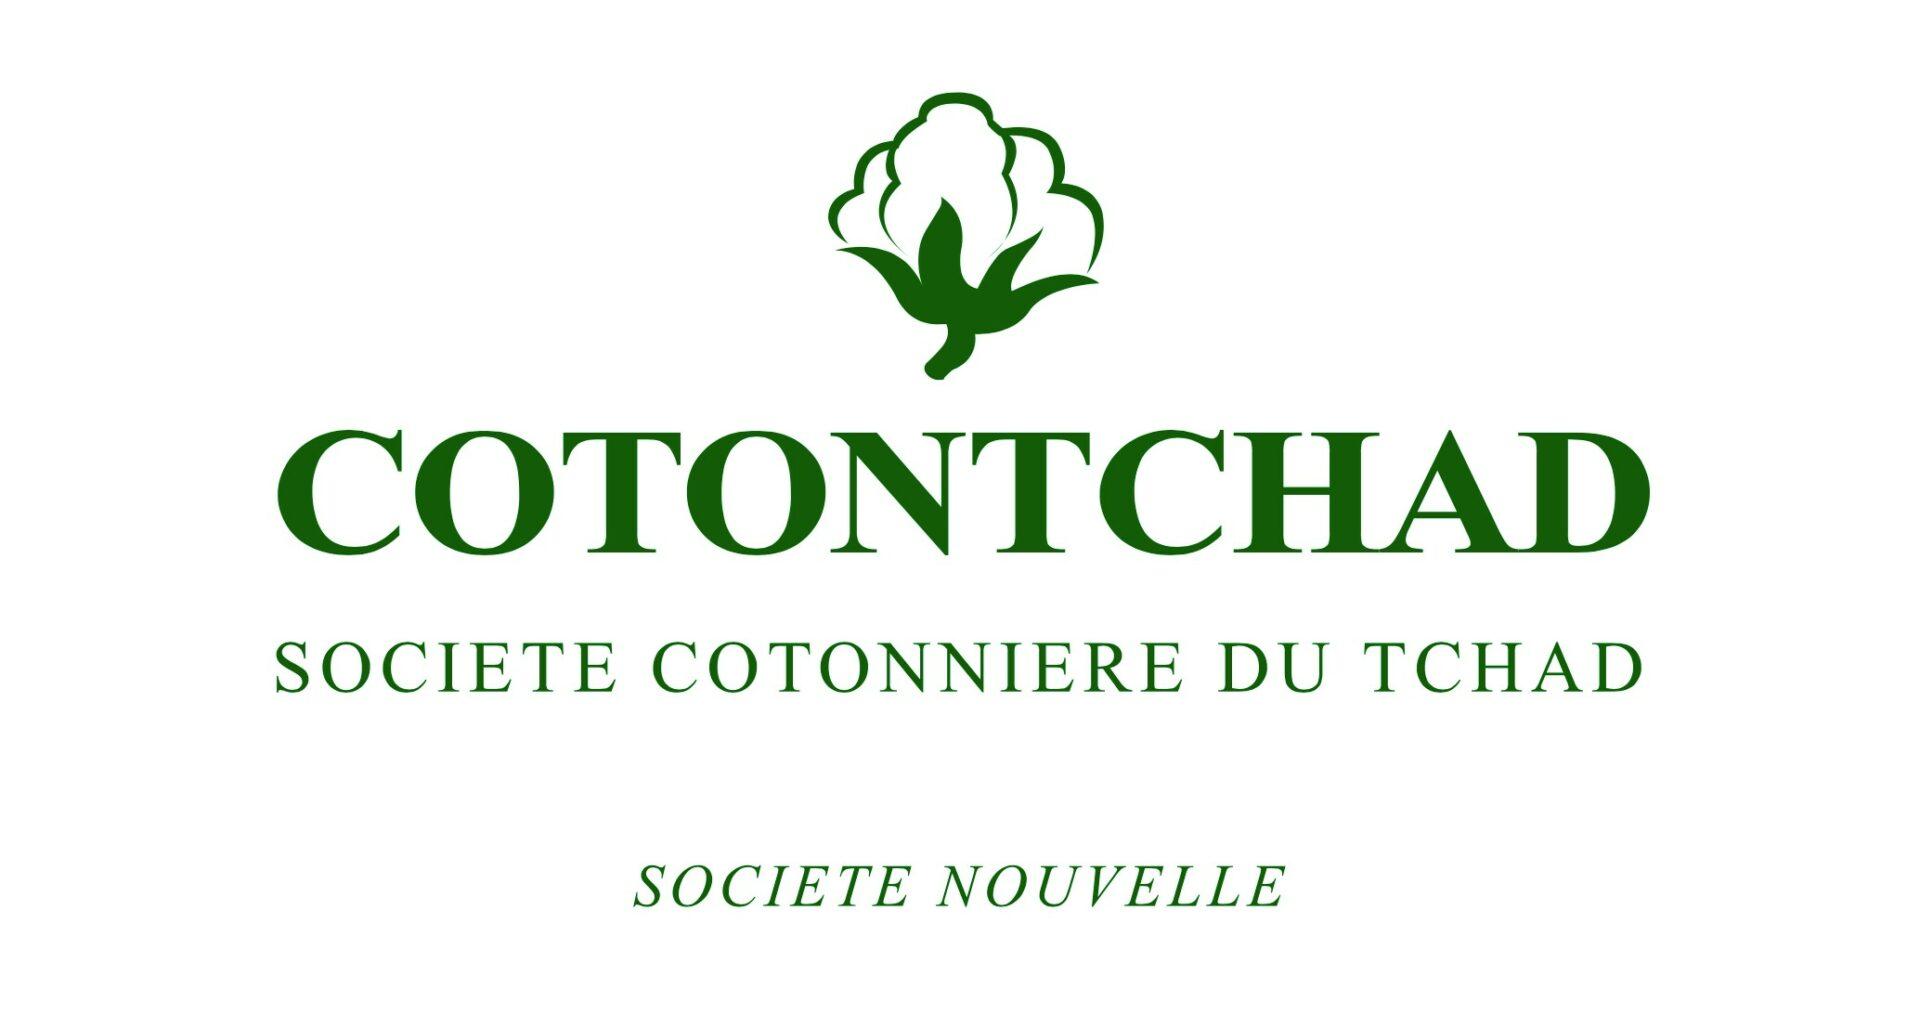 https://cottonmadeinafrica.org/wp-content/uploads/Coton-Tchad_Logo.jpg